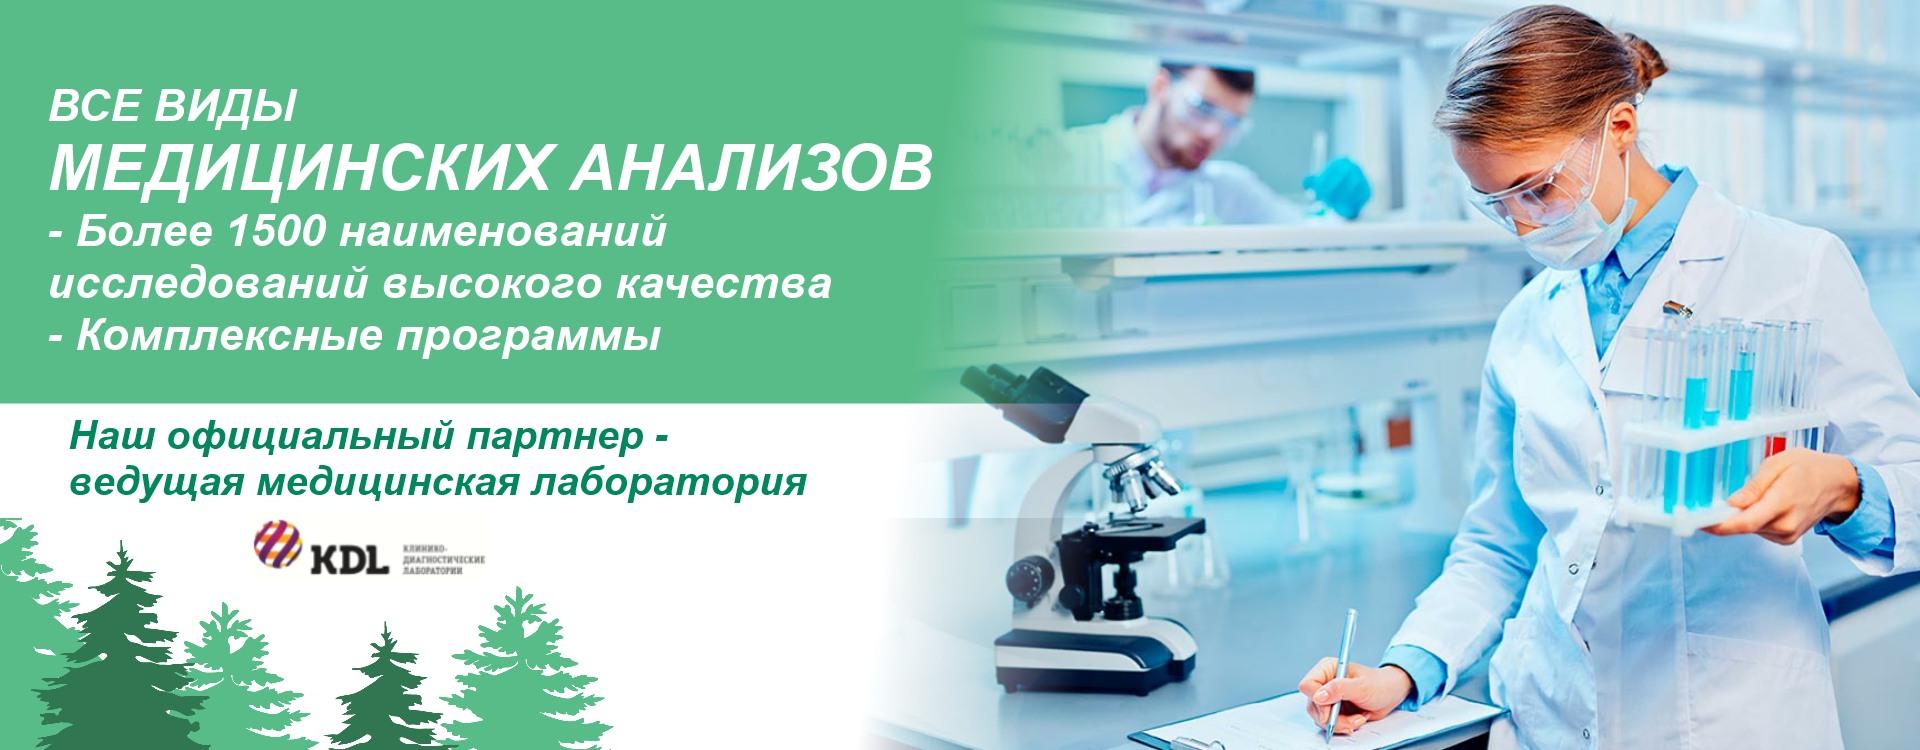 medicinskie-analizy